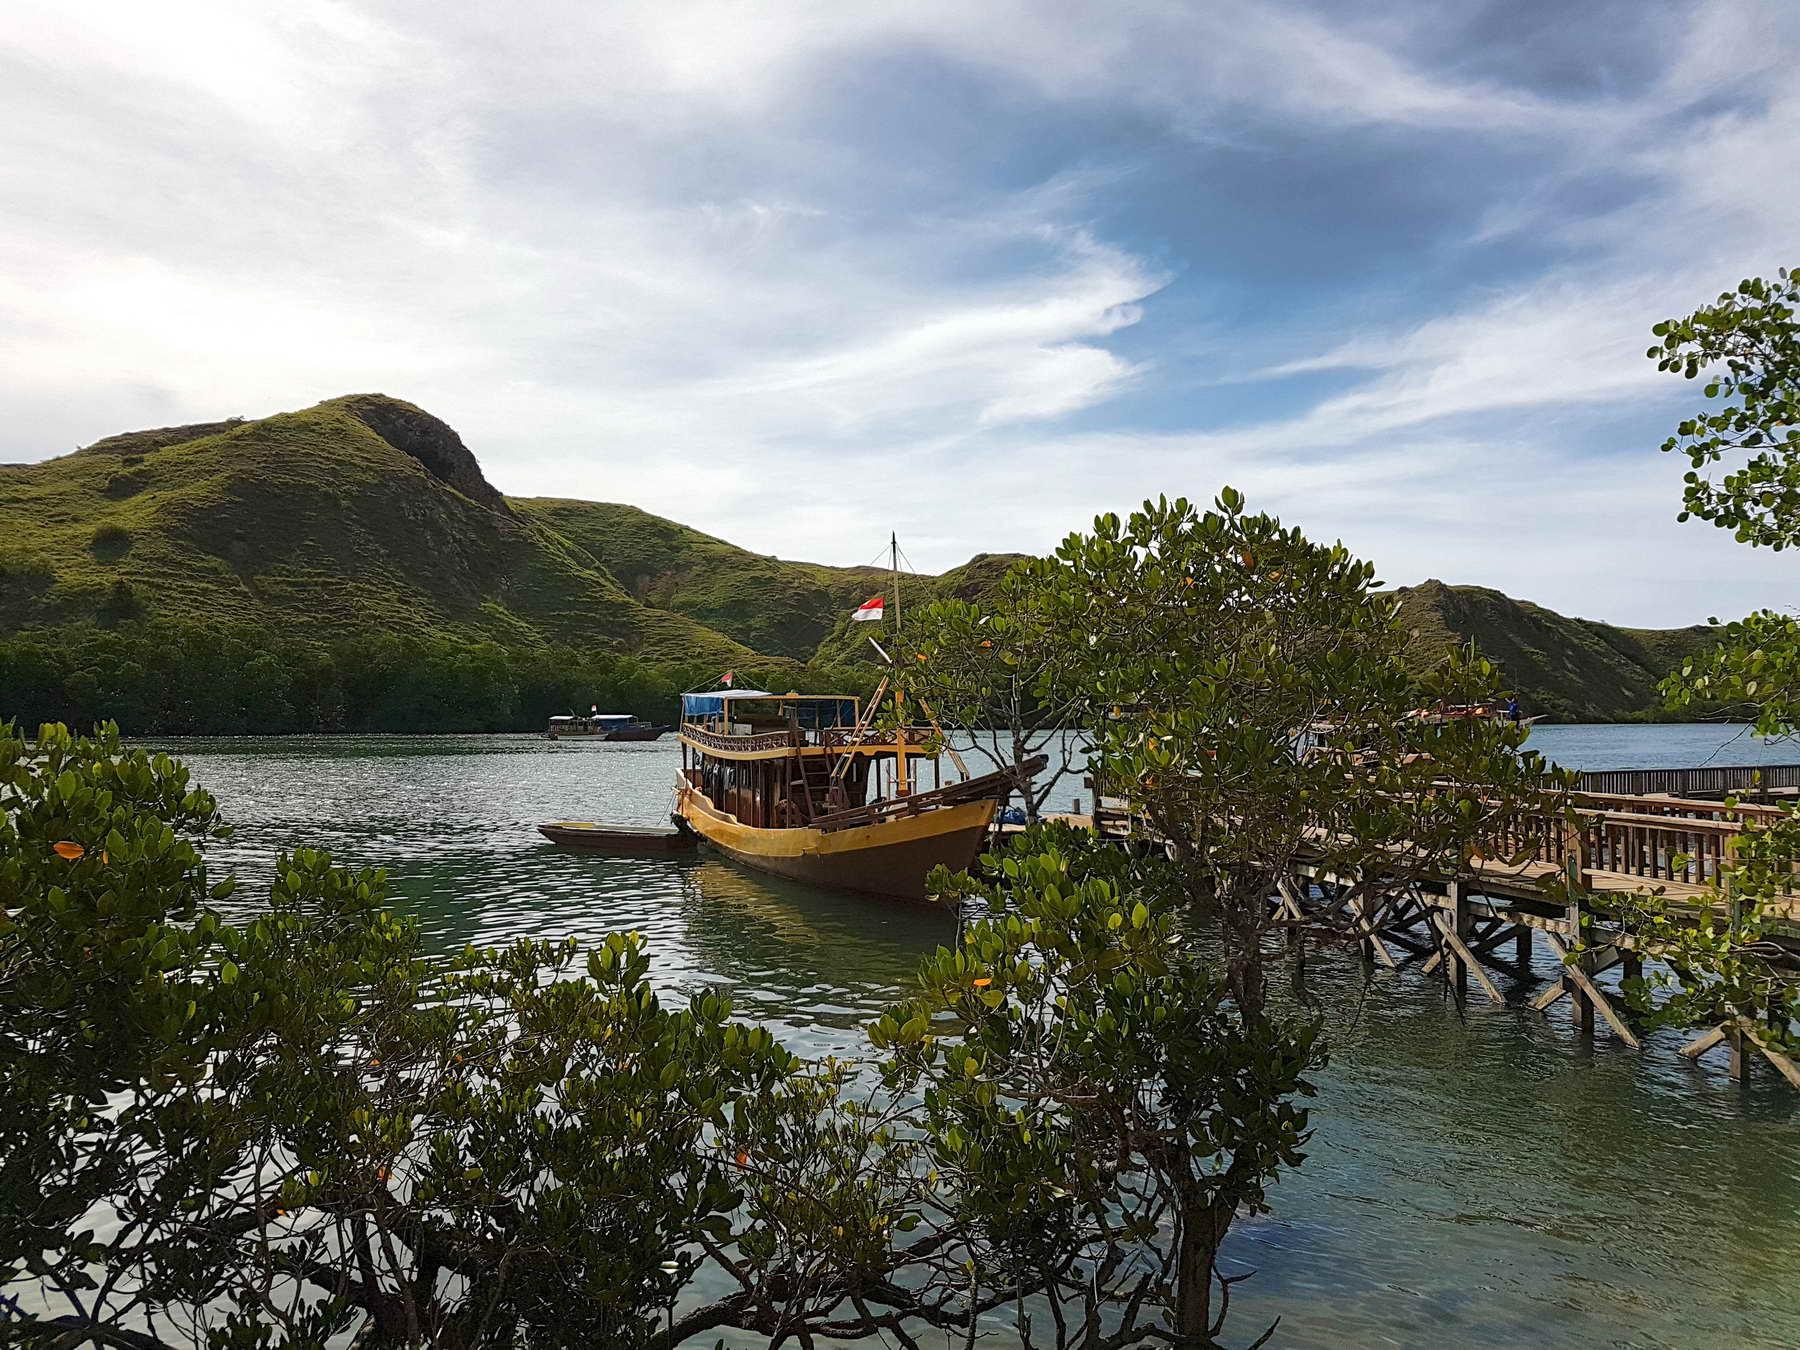 Mit dem Schiff zum Komodo Nationalpark